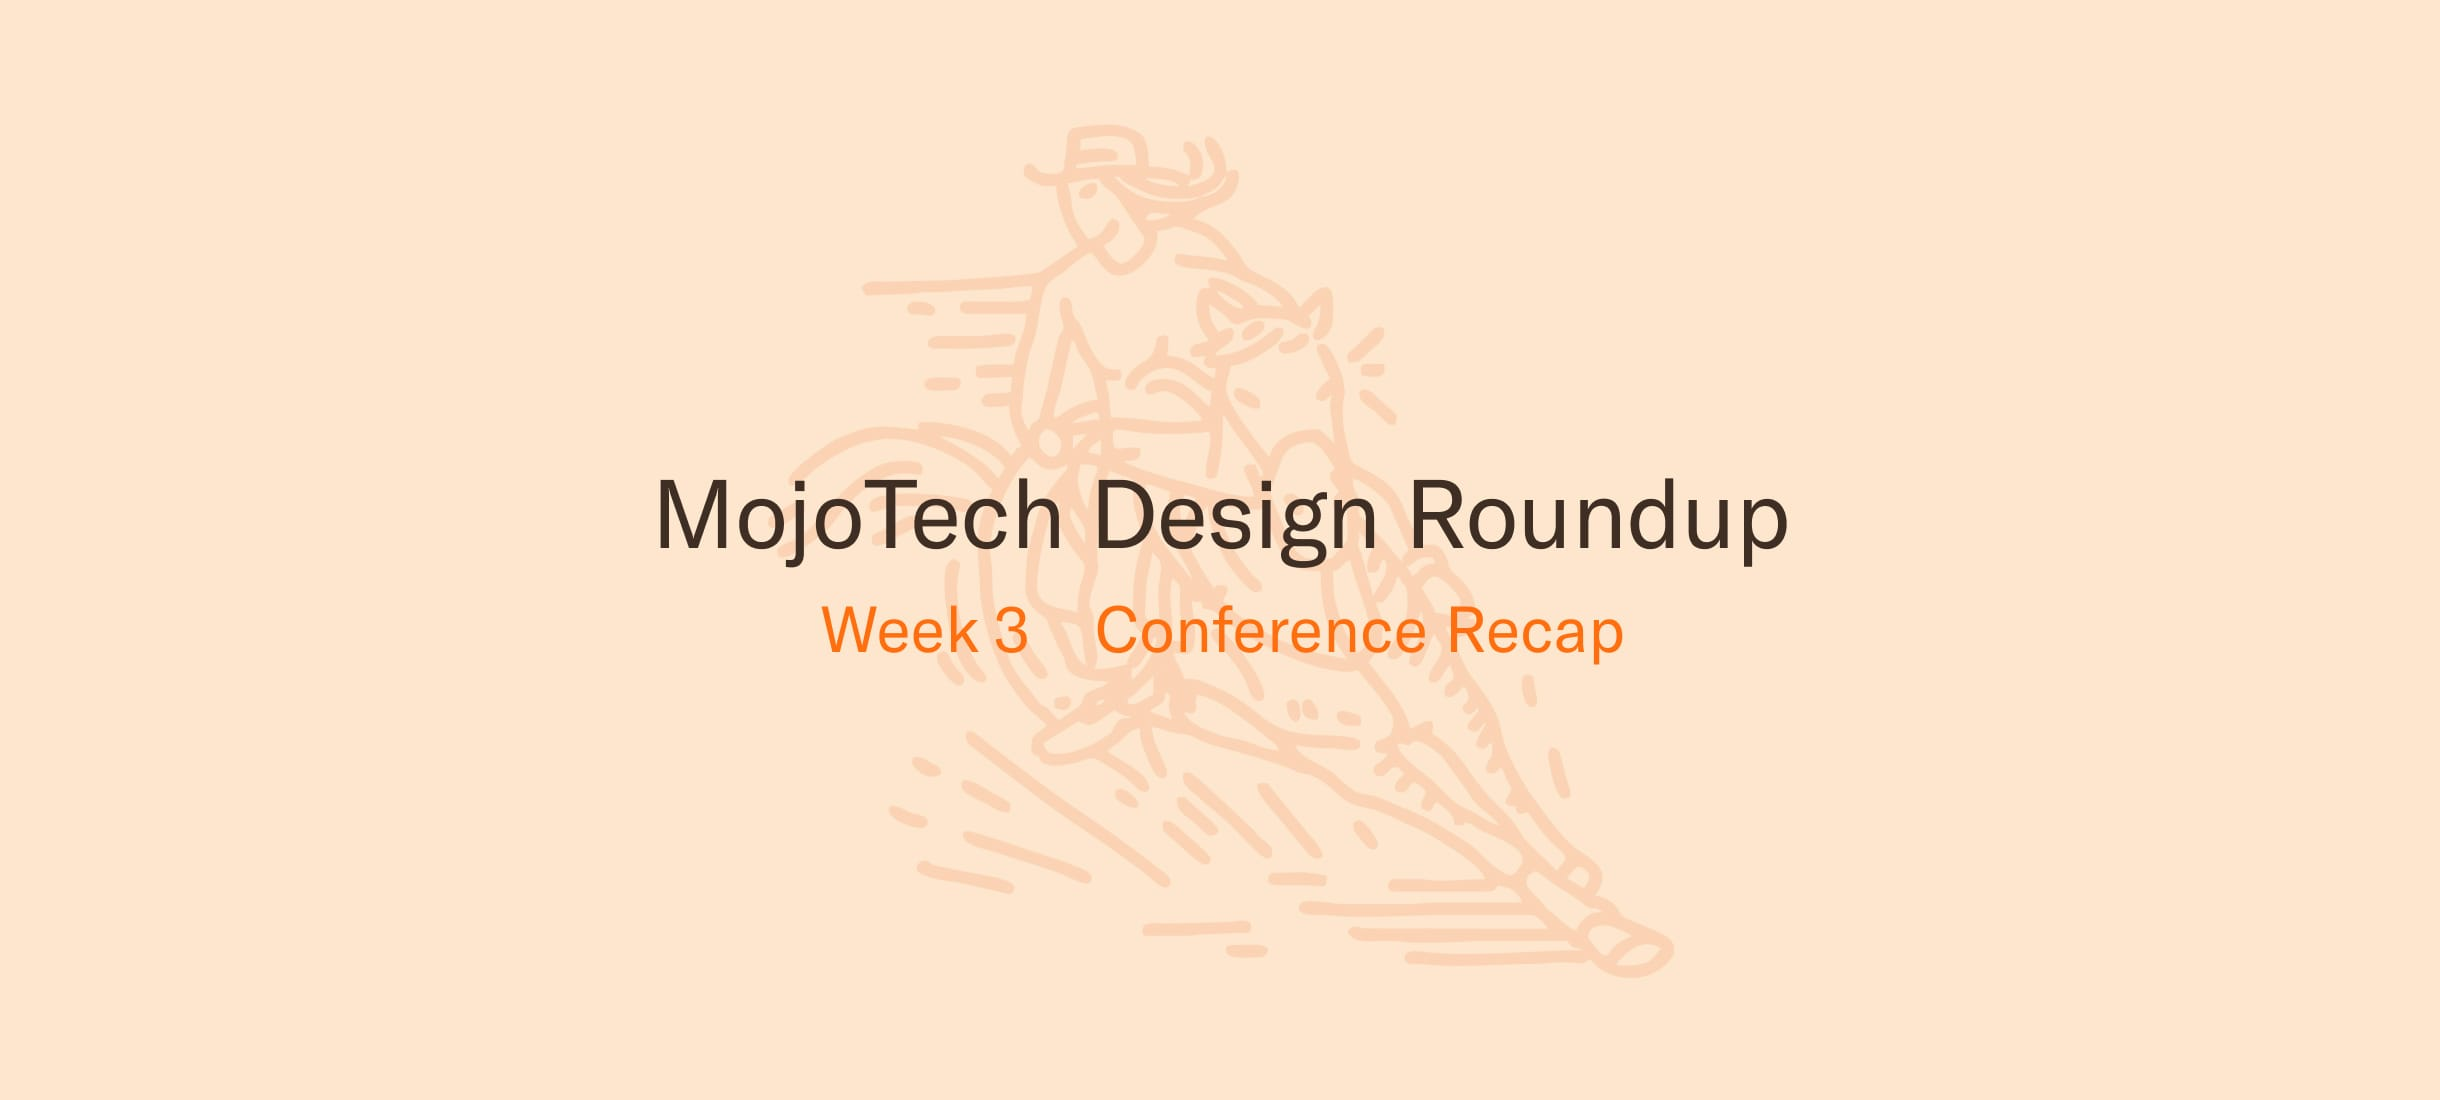 MojoTech Design Round Up Week 3